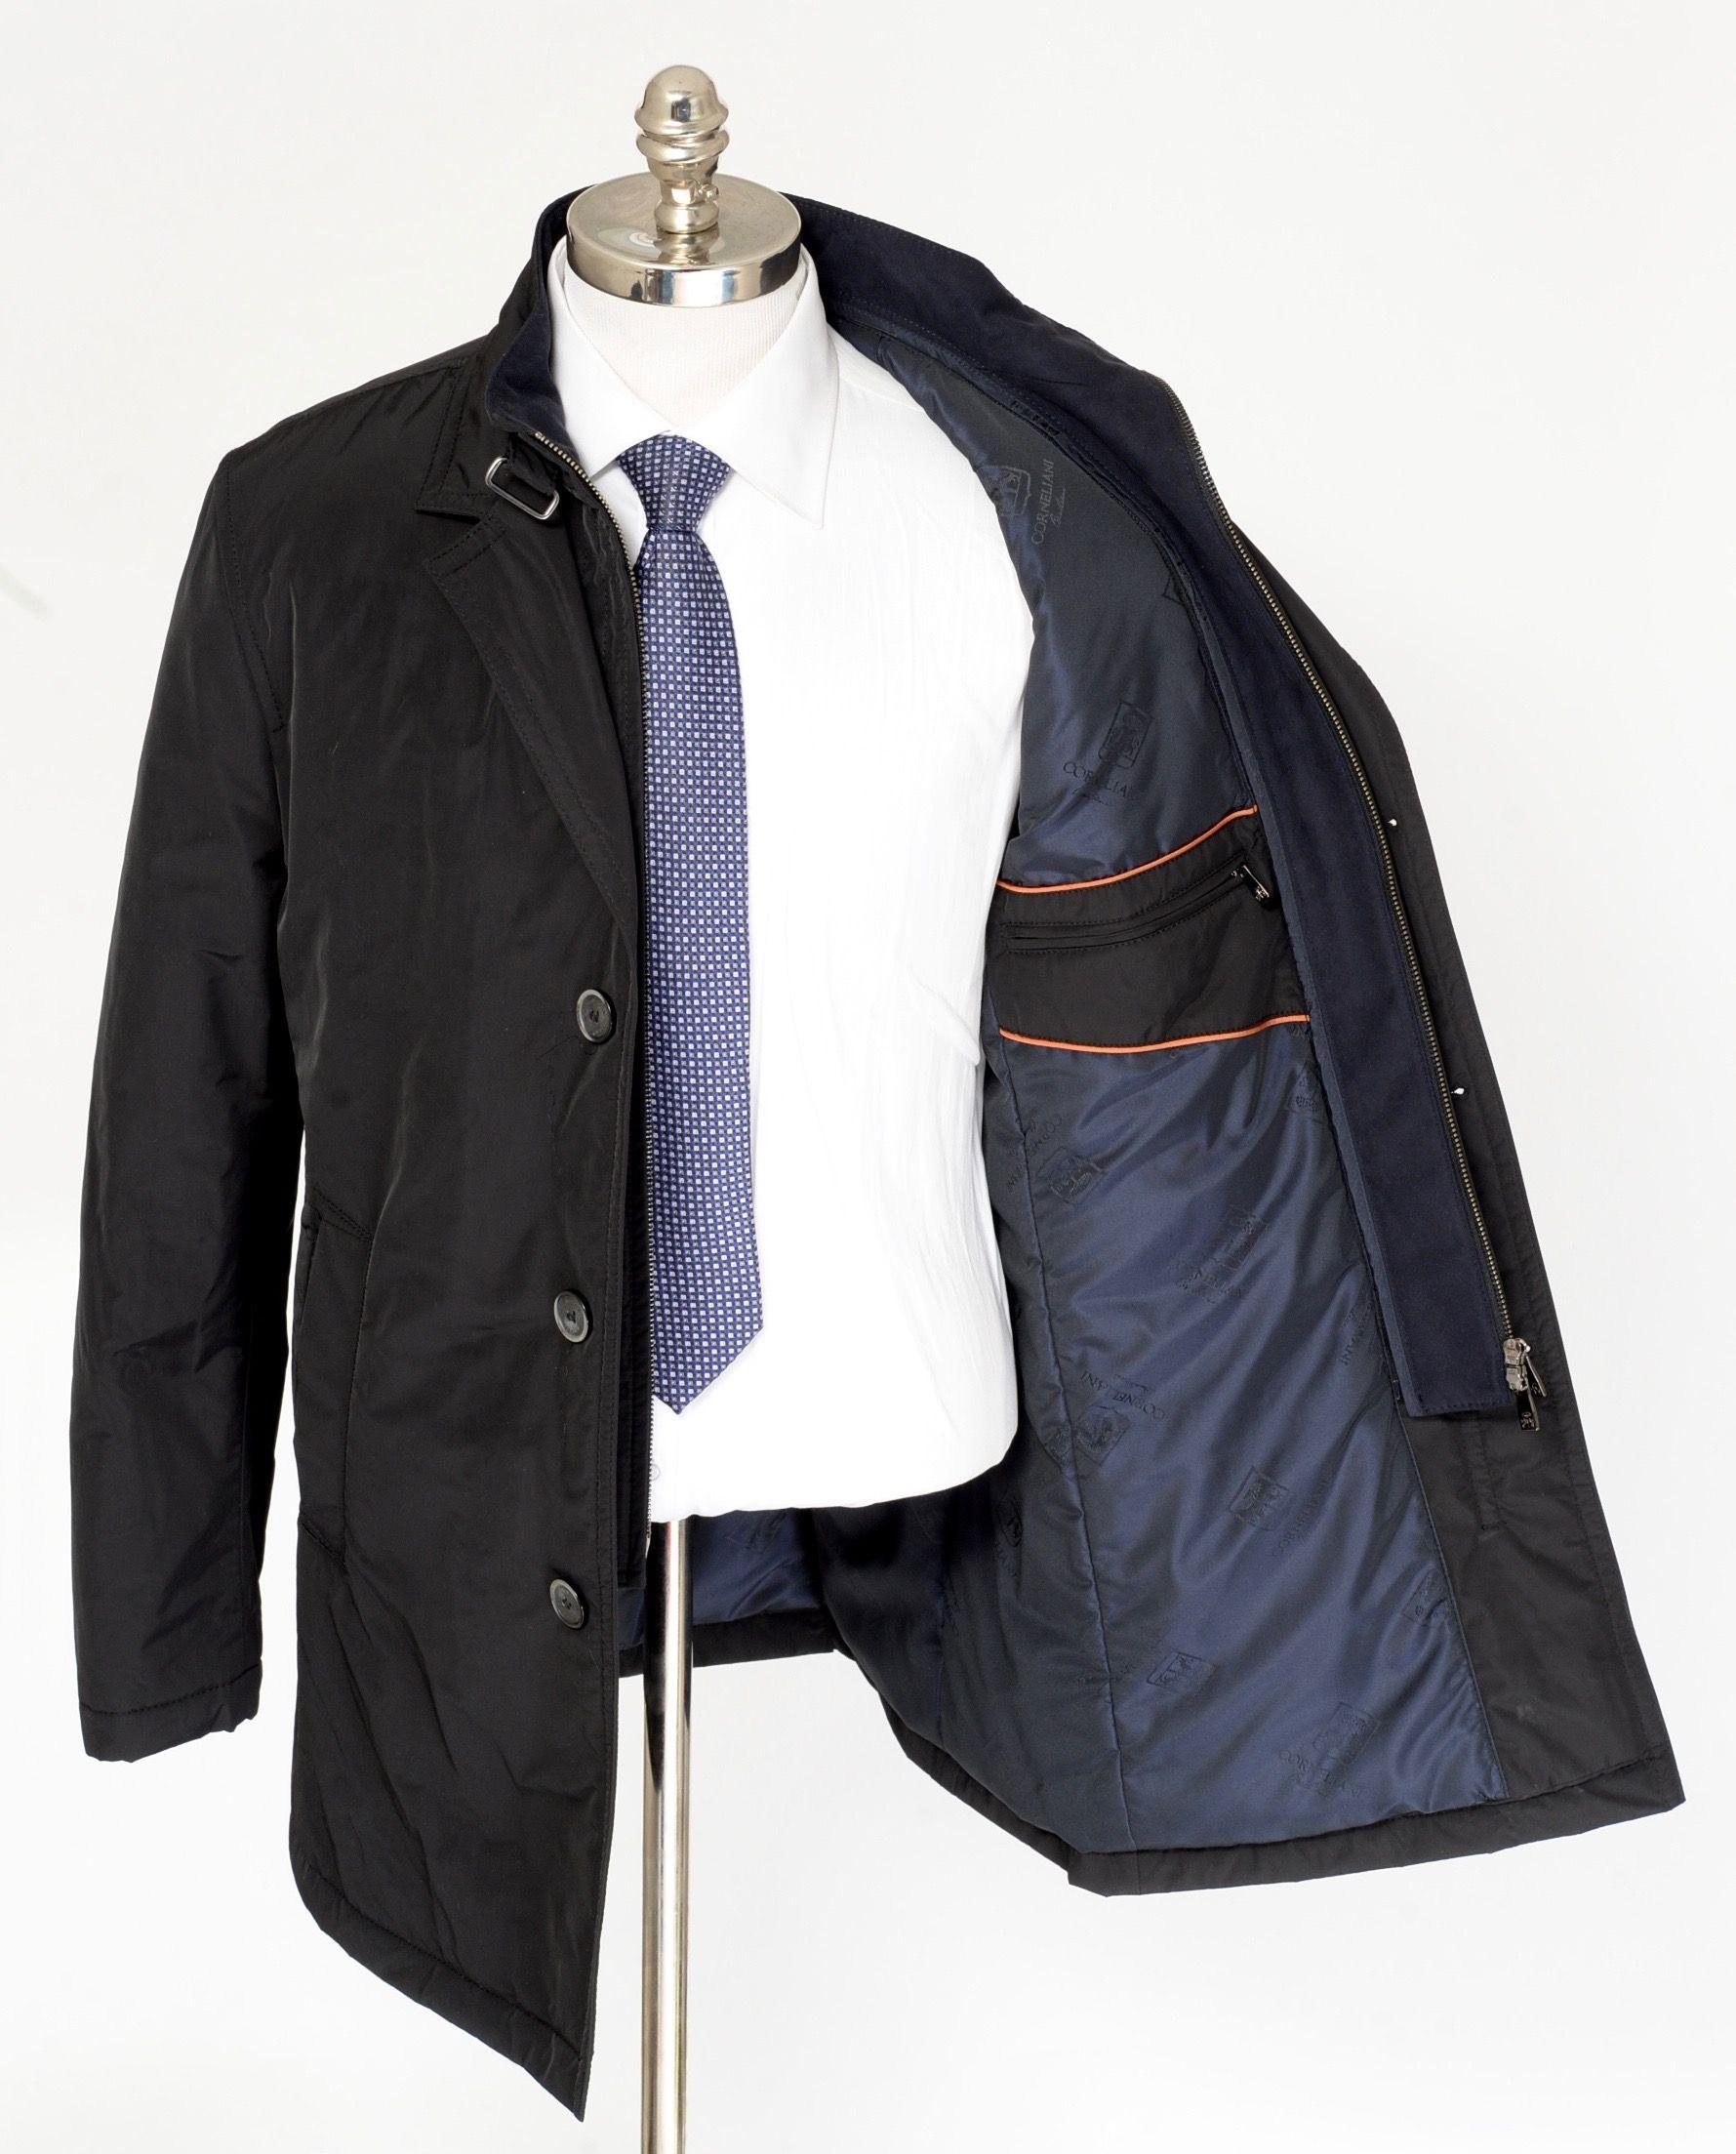 Corneliani Id Black Cotton Water Proof 3btn Field Coat Zip Jacket Mens Designer Fashion Coat Coat Fashion [ 2207 x 1779 Pixel ]